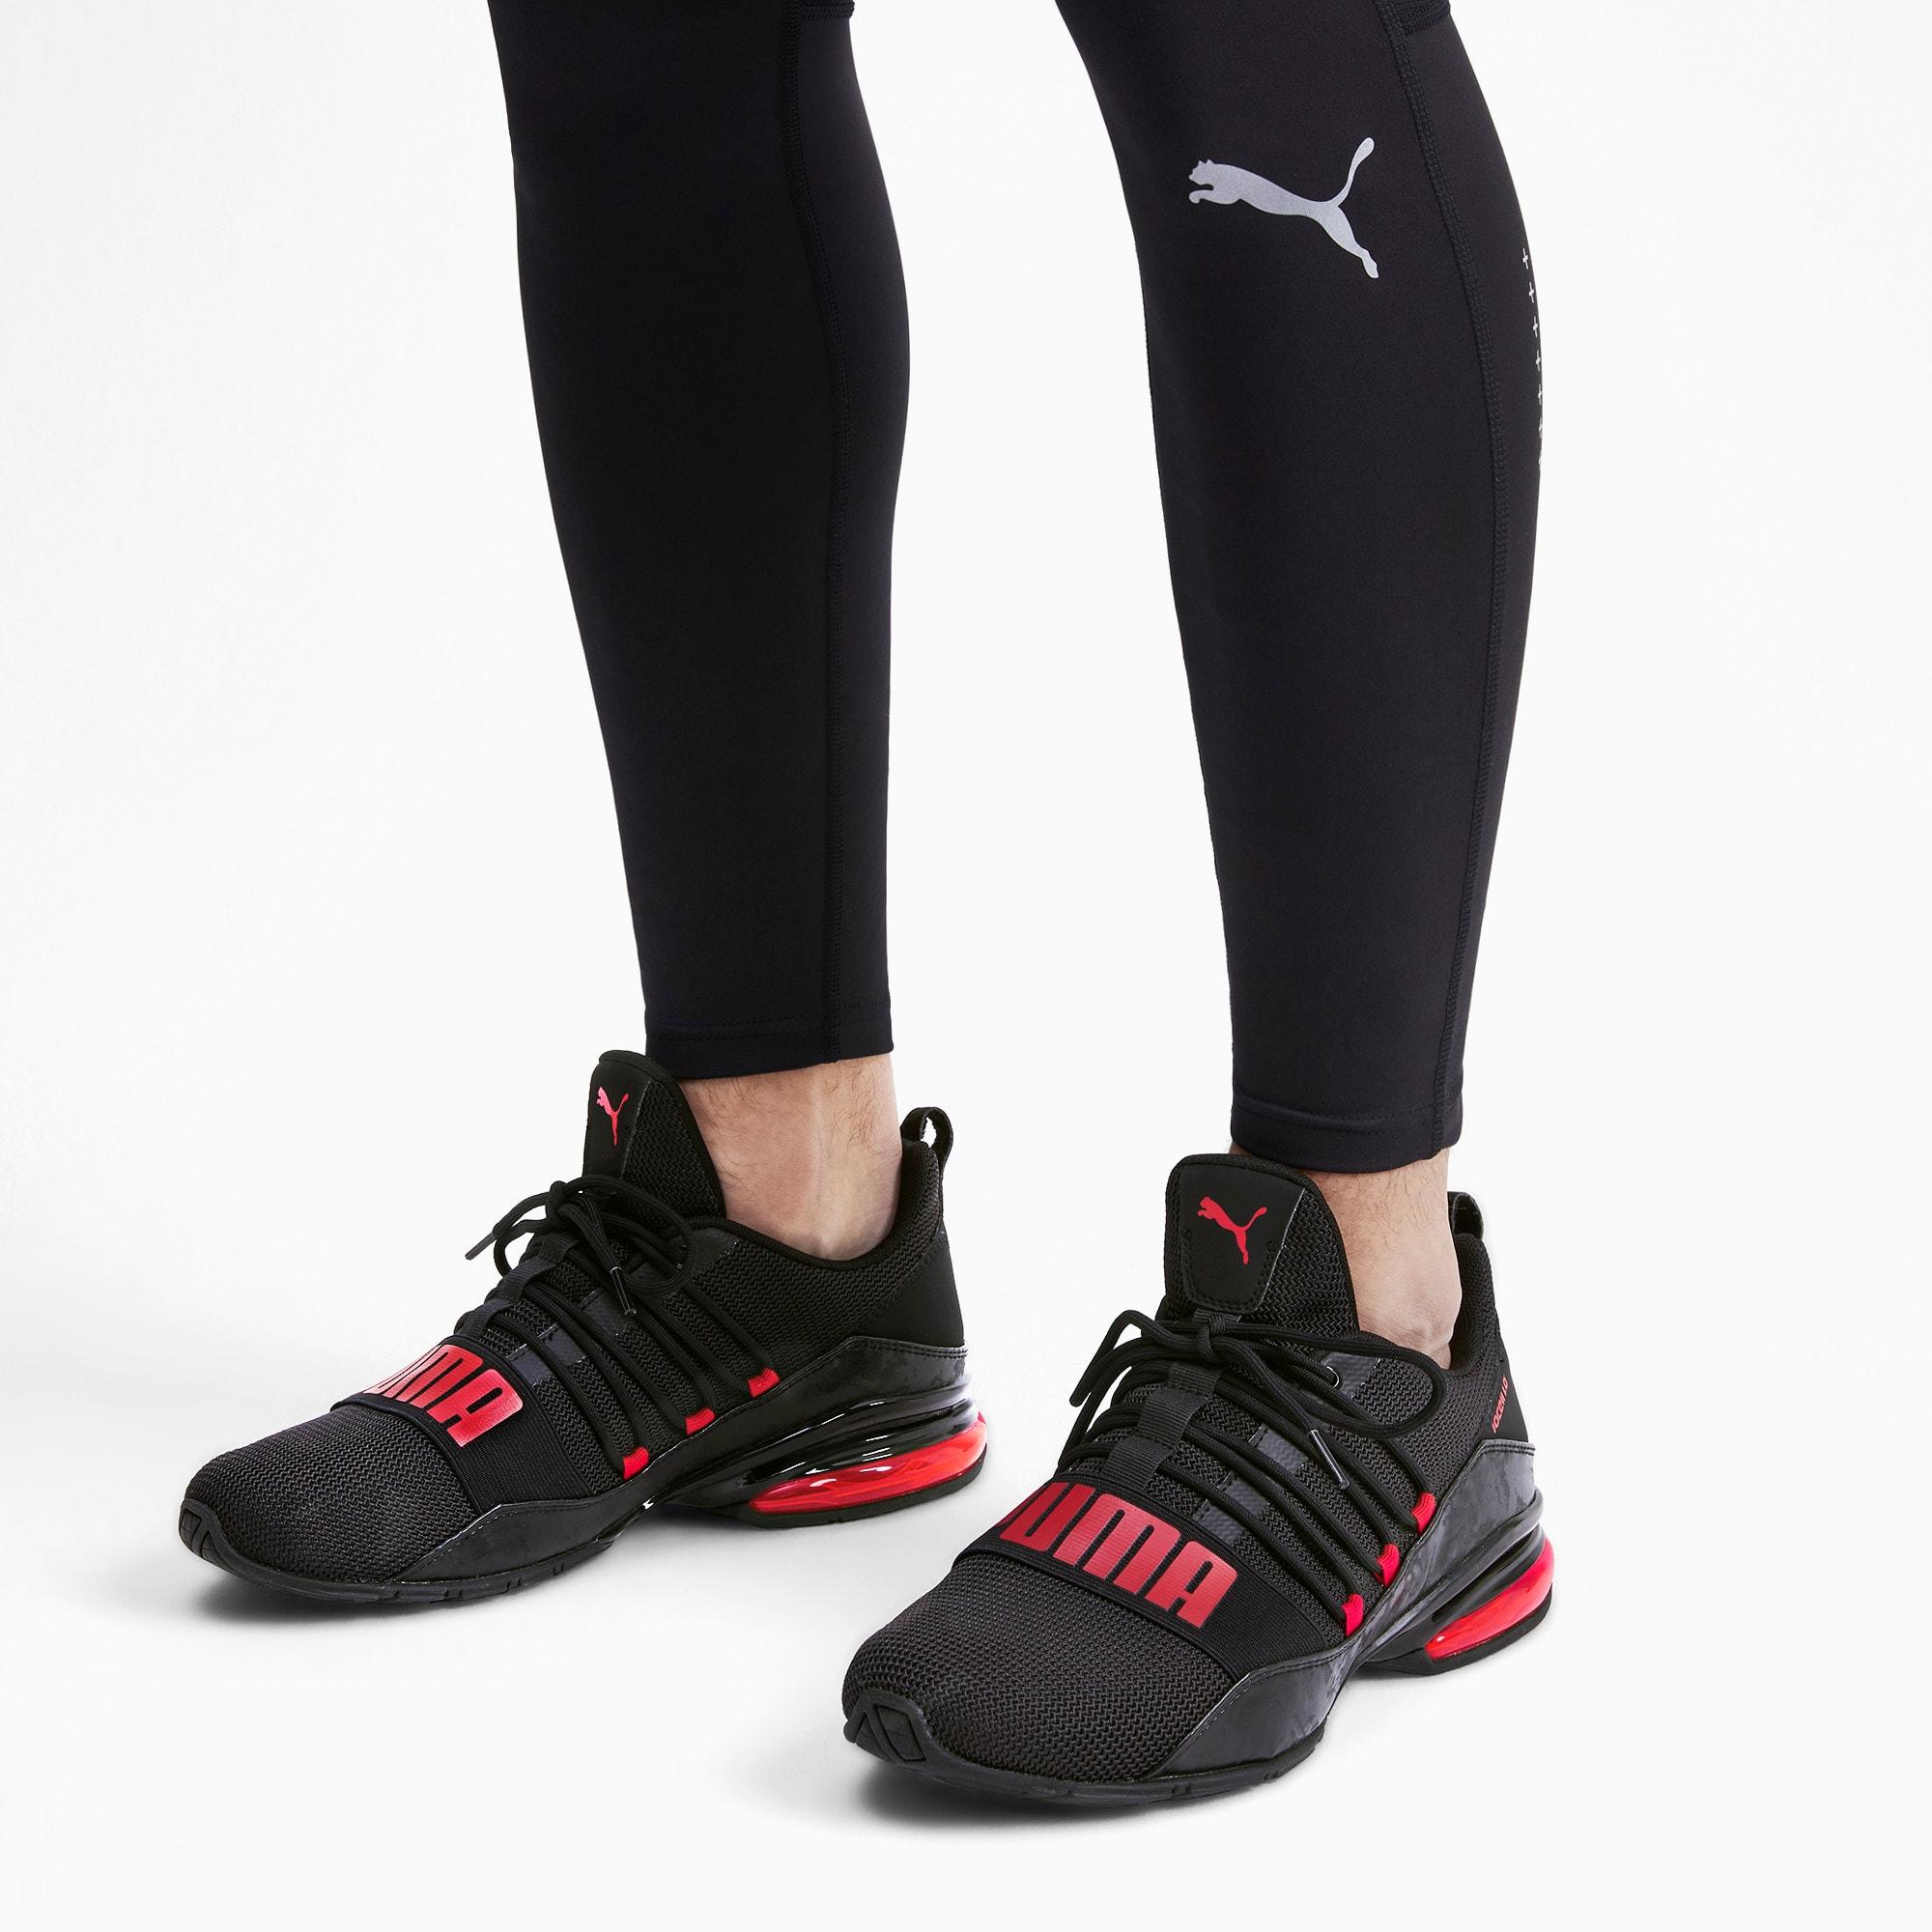 Miniatura 3 de Zapatos de entrenamiento CELL Regulate Camo para hombre, Puma Black-Rhubarb, mediano